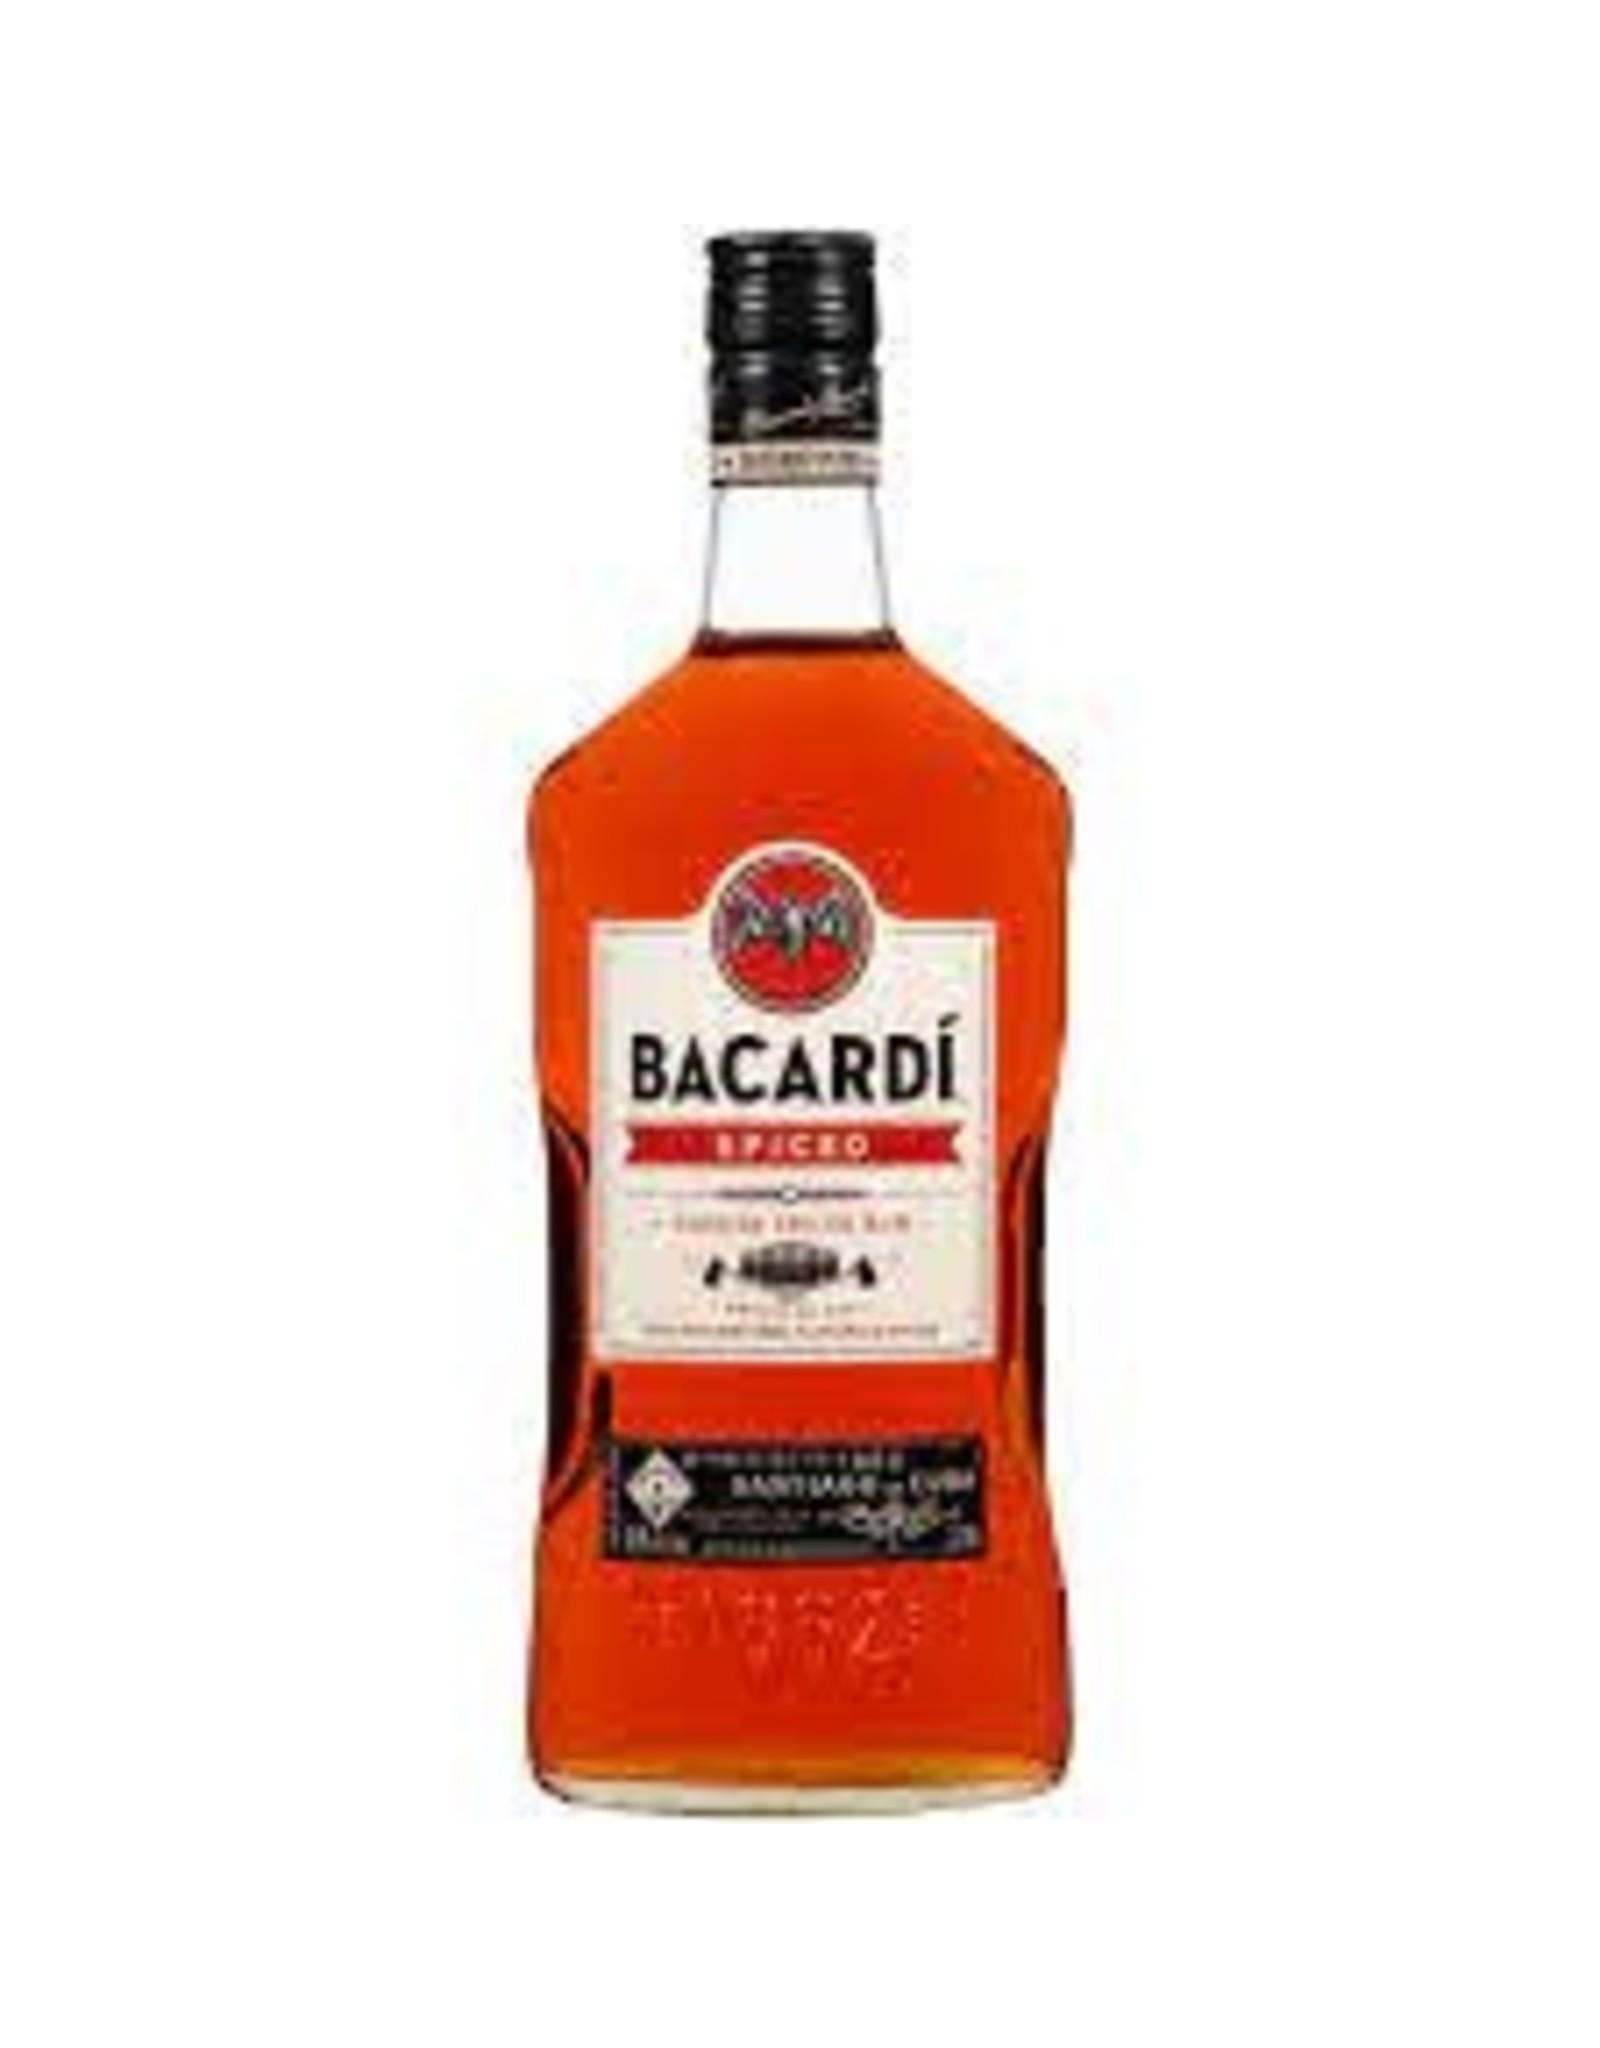 BACARDI SPICED RUM 1.75L